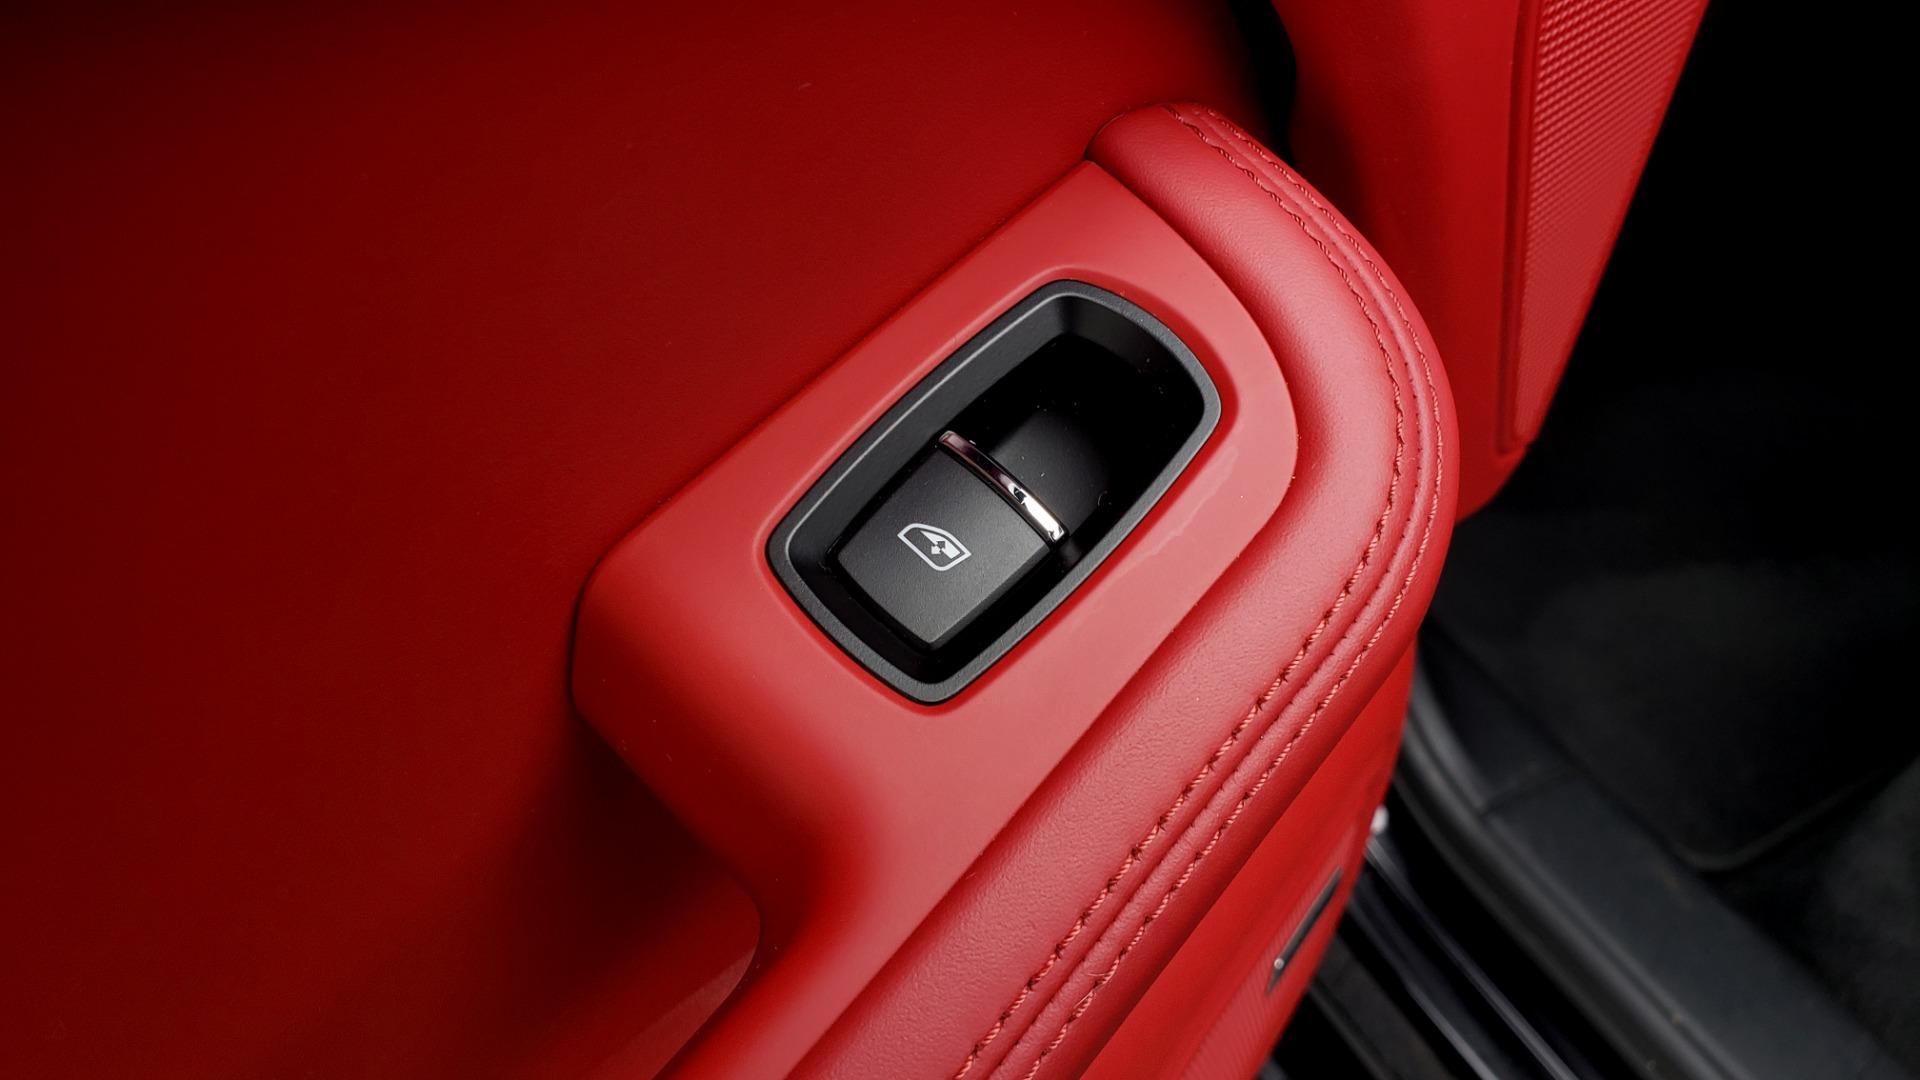 Used 2016 Porsche MACAN TURBO / PREM / NAV / PARK ASST / BOSE / PDK / CHRONO PKG for sale Sold at Formula Imports in Charlotte NC 28227 64